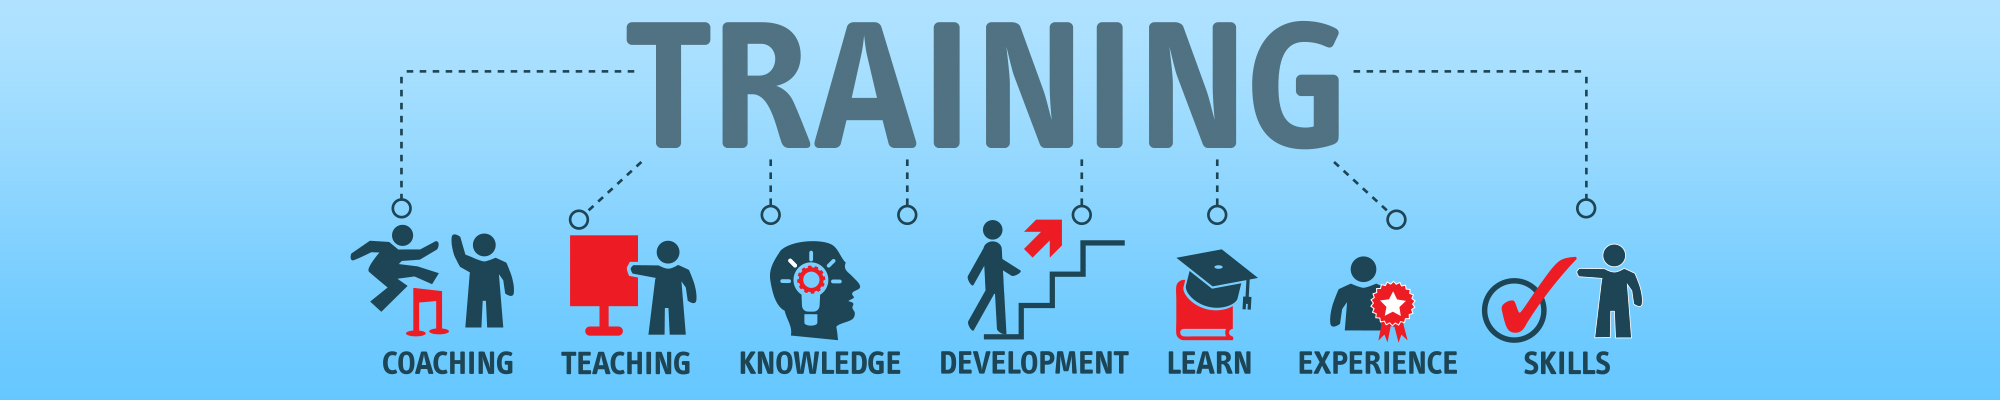 training-bg